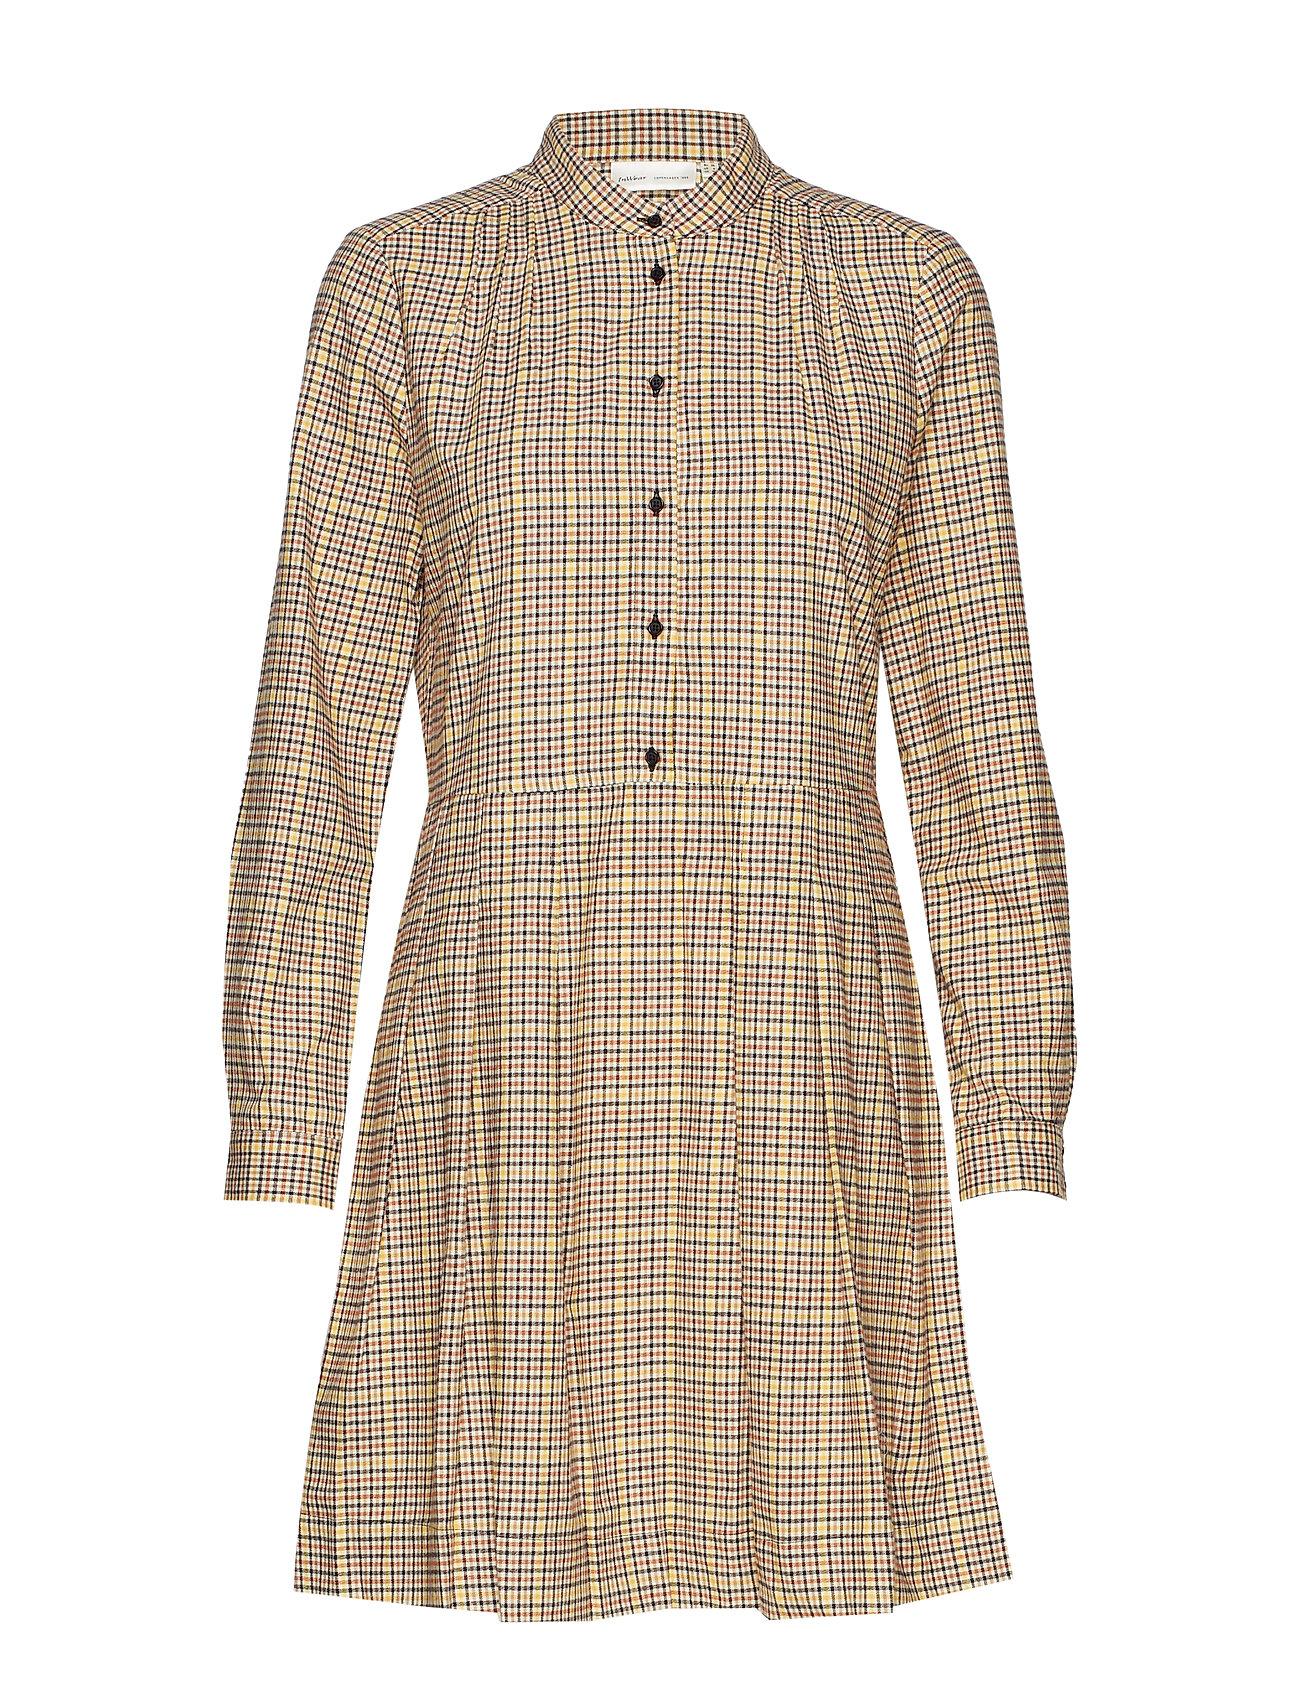 InWear KellisIW Dress - SPECTRA YELLOW MINI CHECK